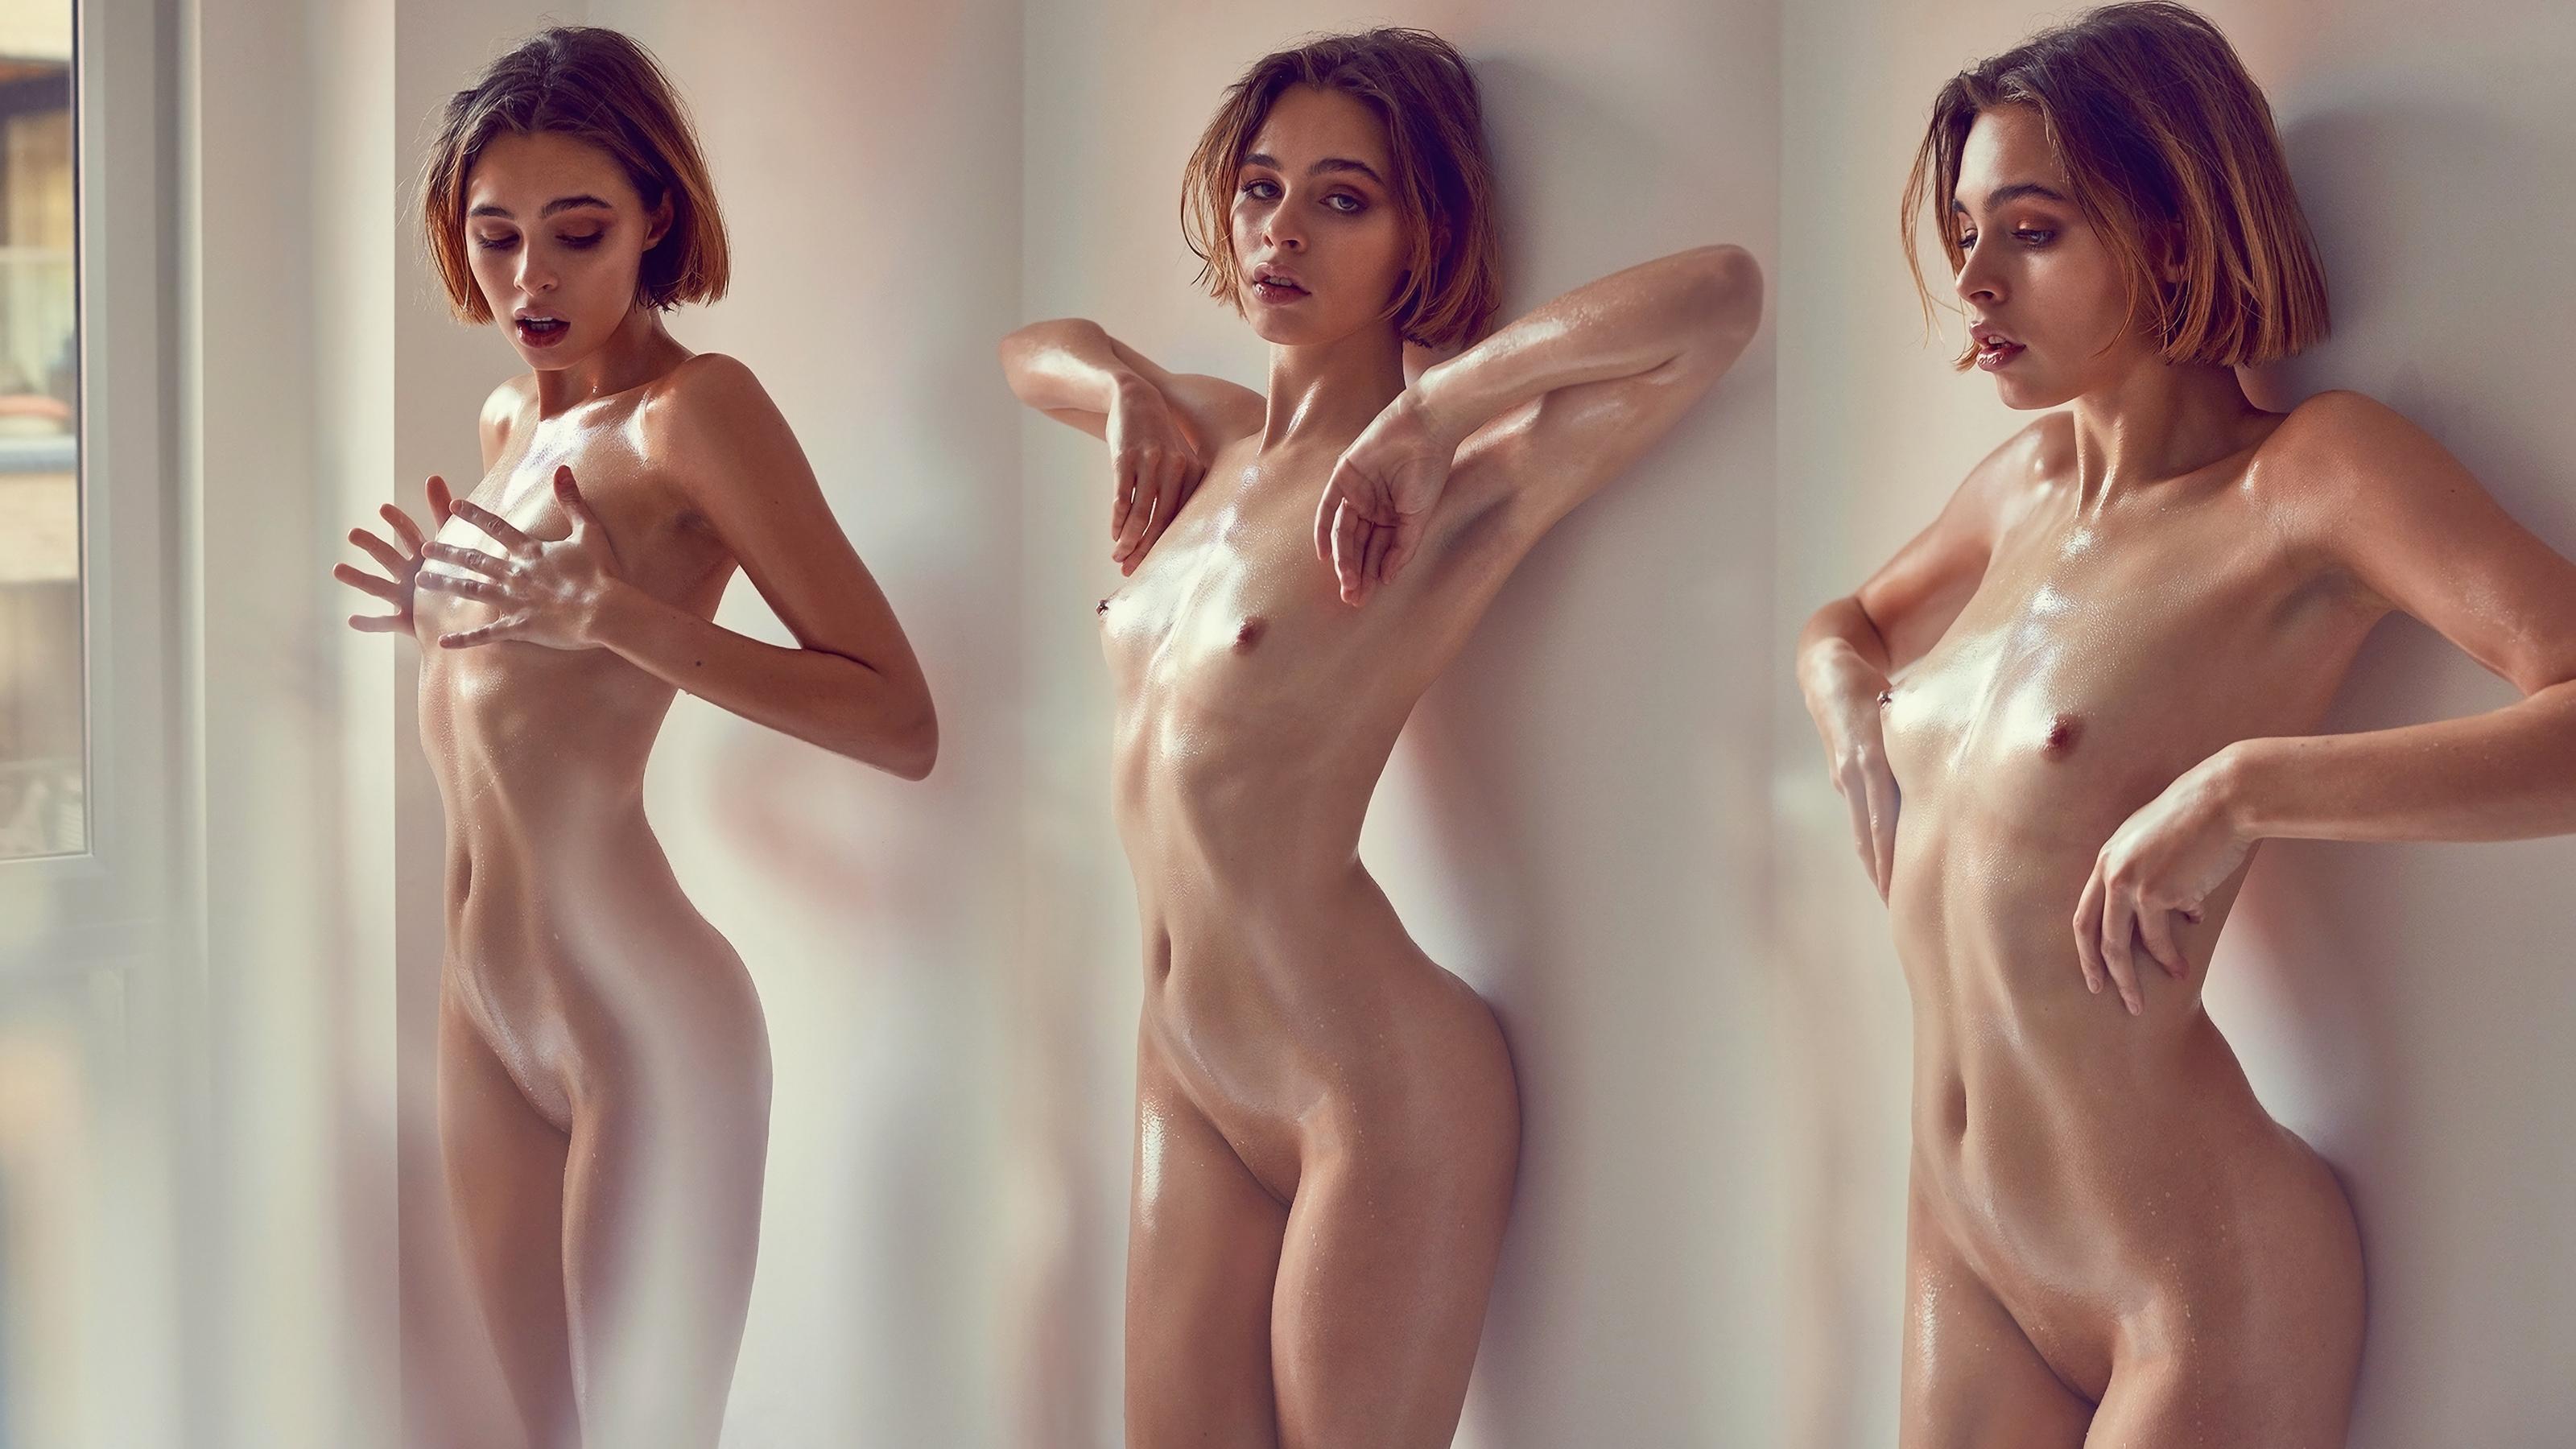 Hegre model alice nude